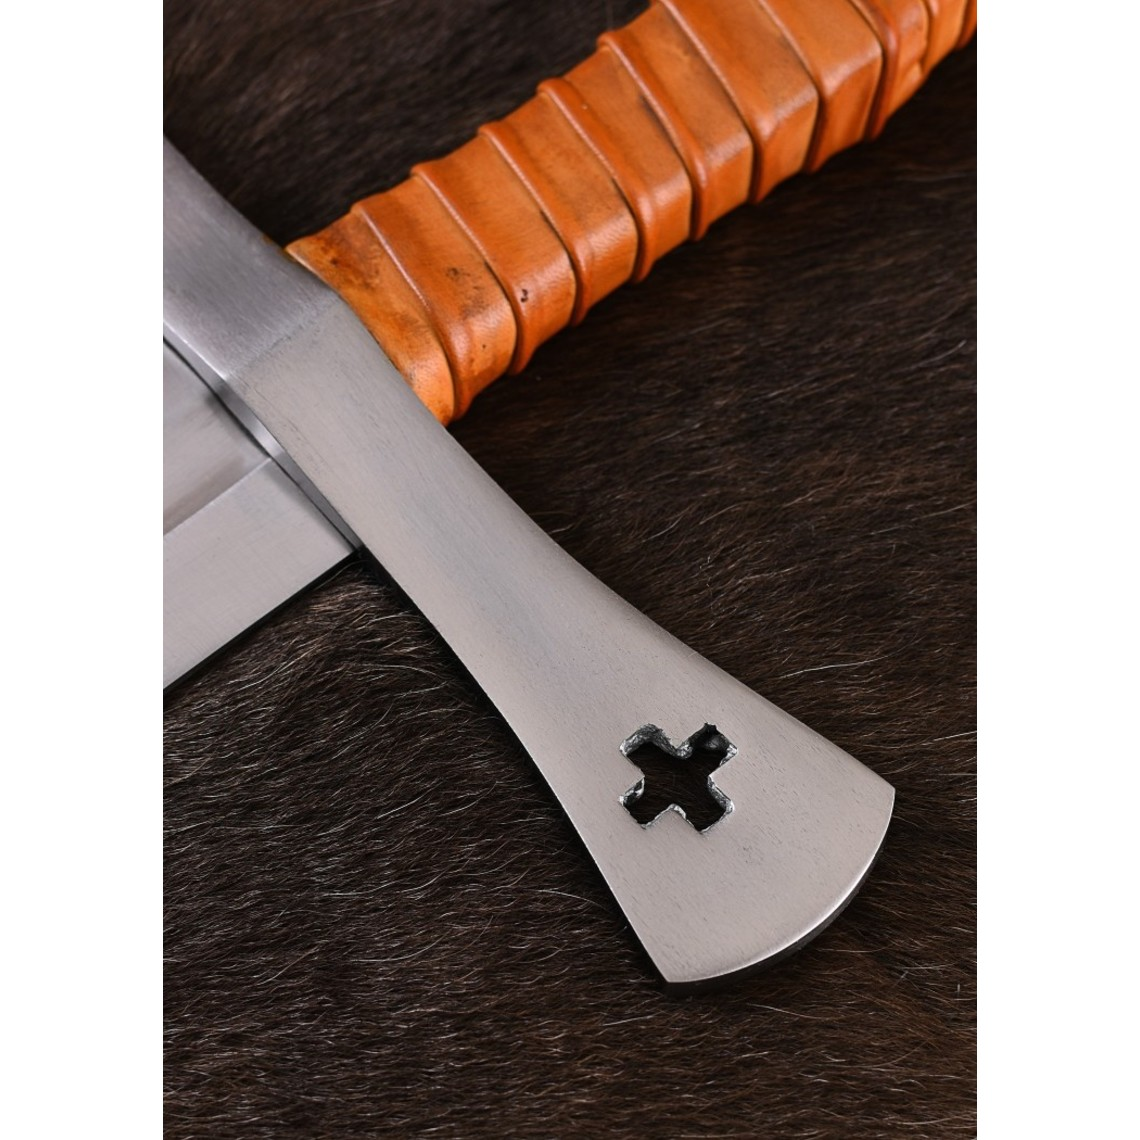 Deepeeka 15th century hand-and-a-half sword Shrewsbury, semi-sharp